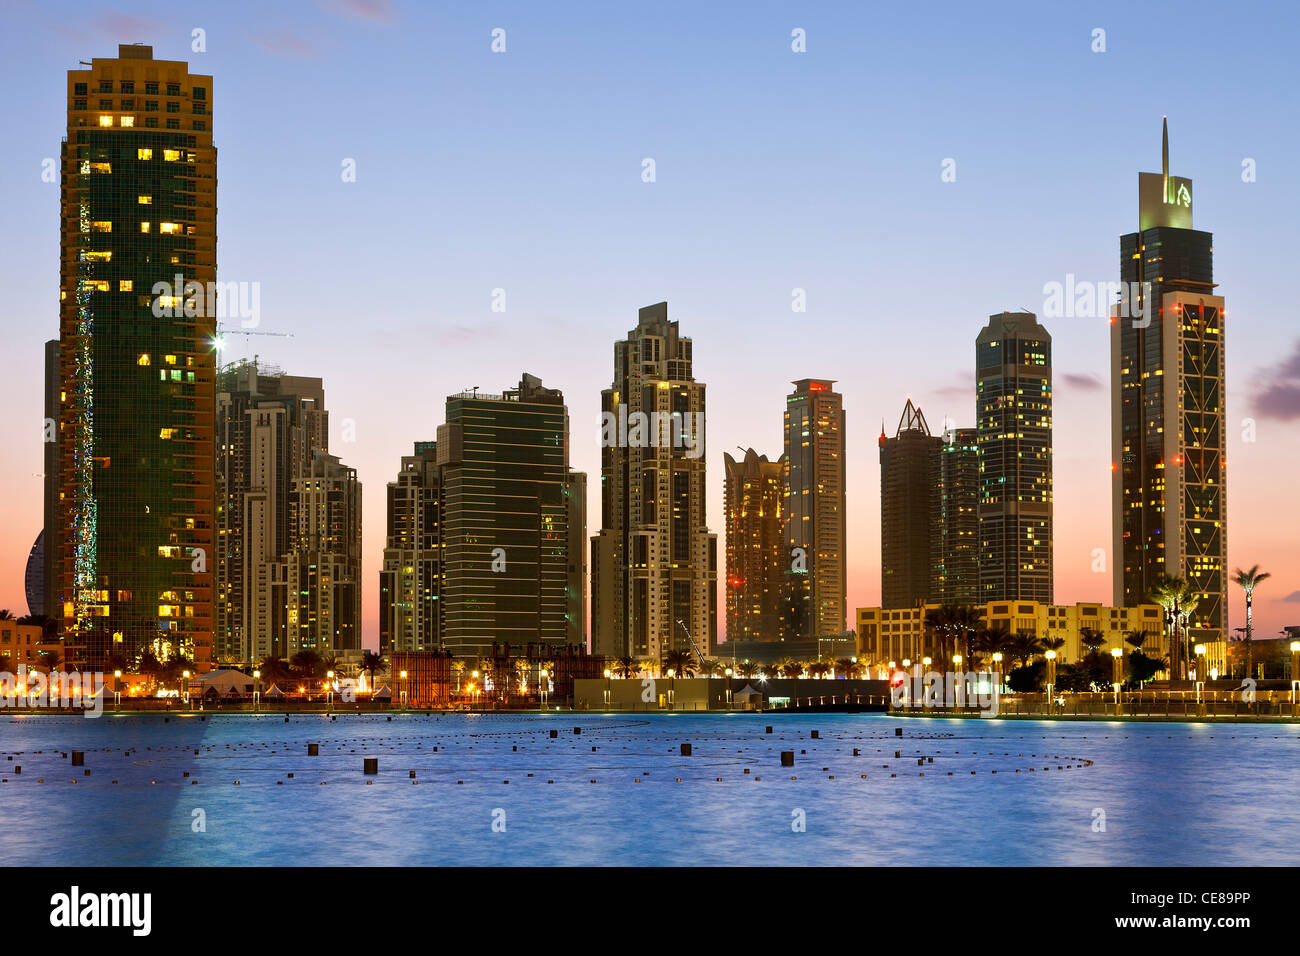 Dubai, Skyscrapers at Night - Stock Image